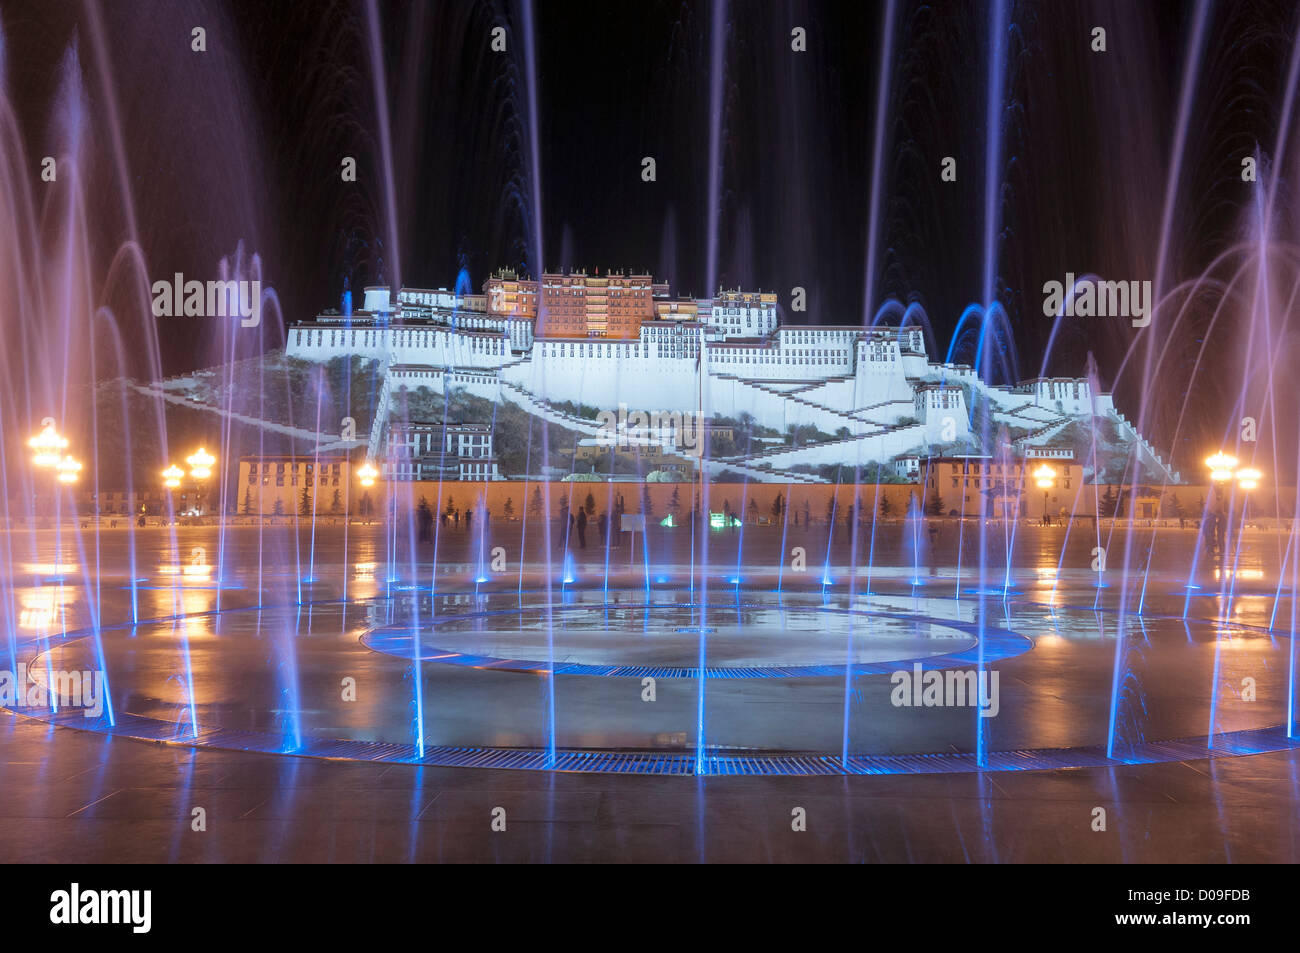 Fountains dance to music during light show at Chinese-bulit plaza below Portala Palace, Lhasa, Tibet, China - Stock Image